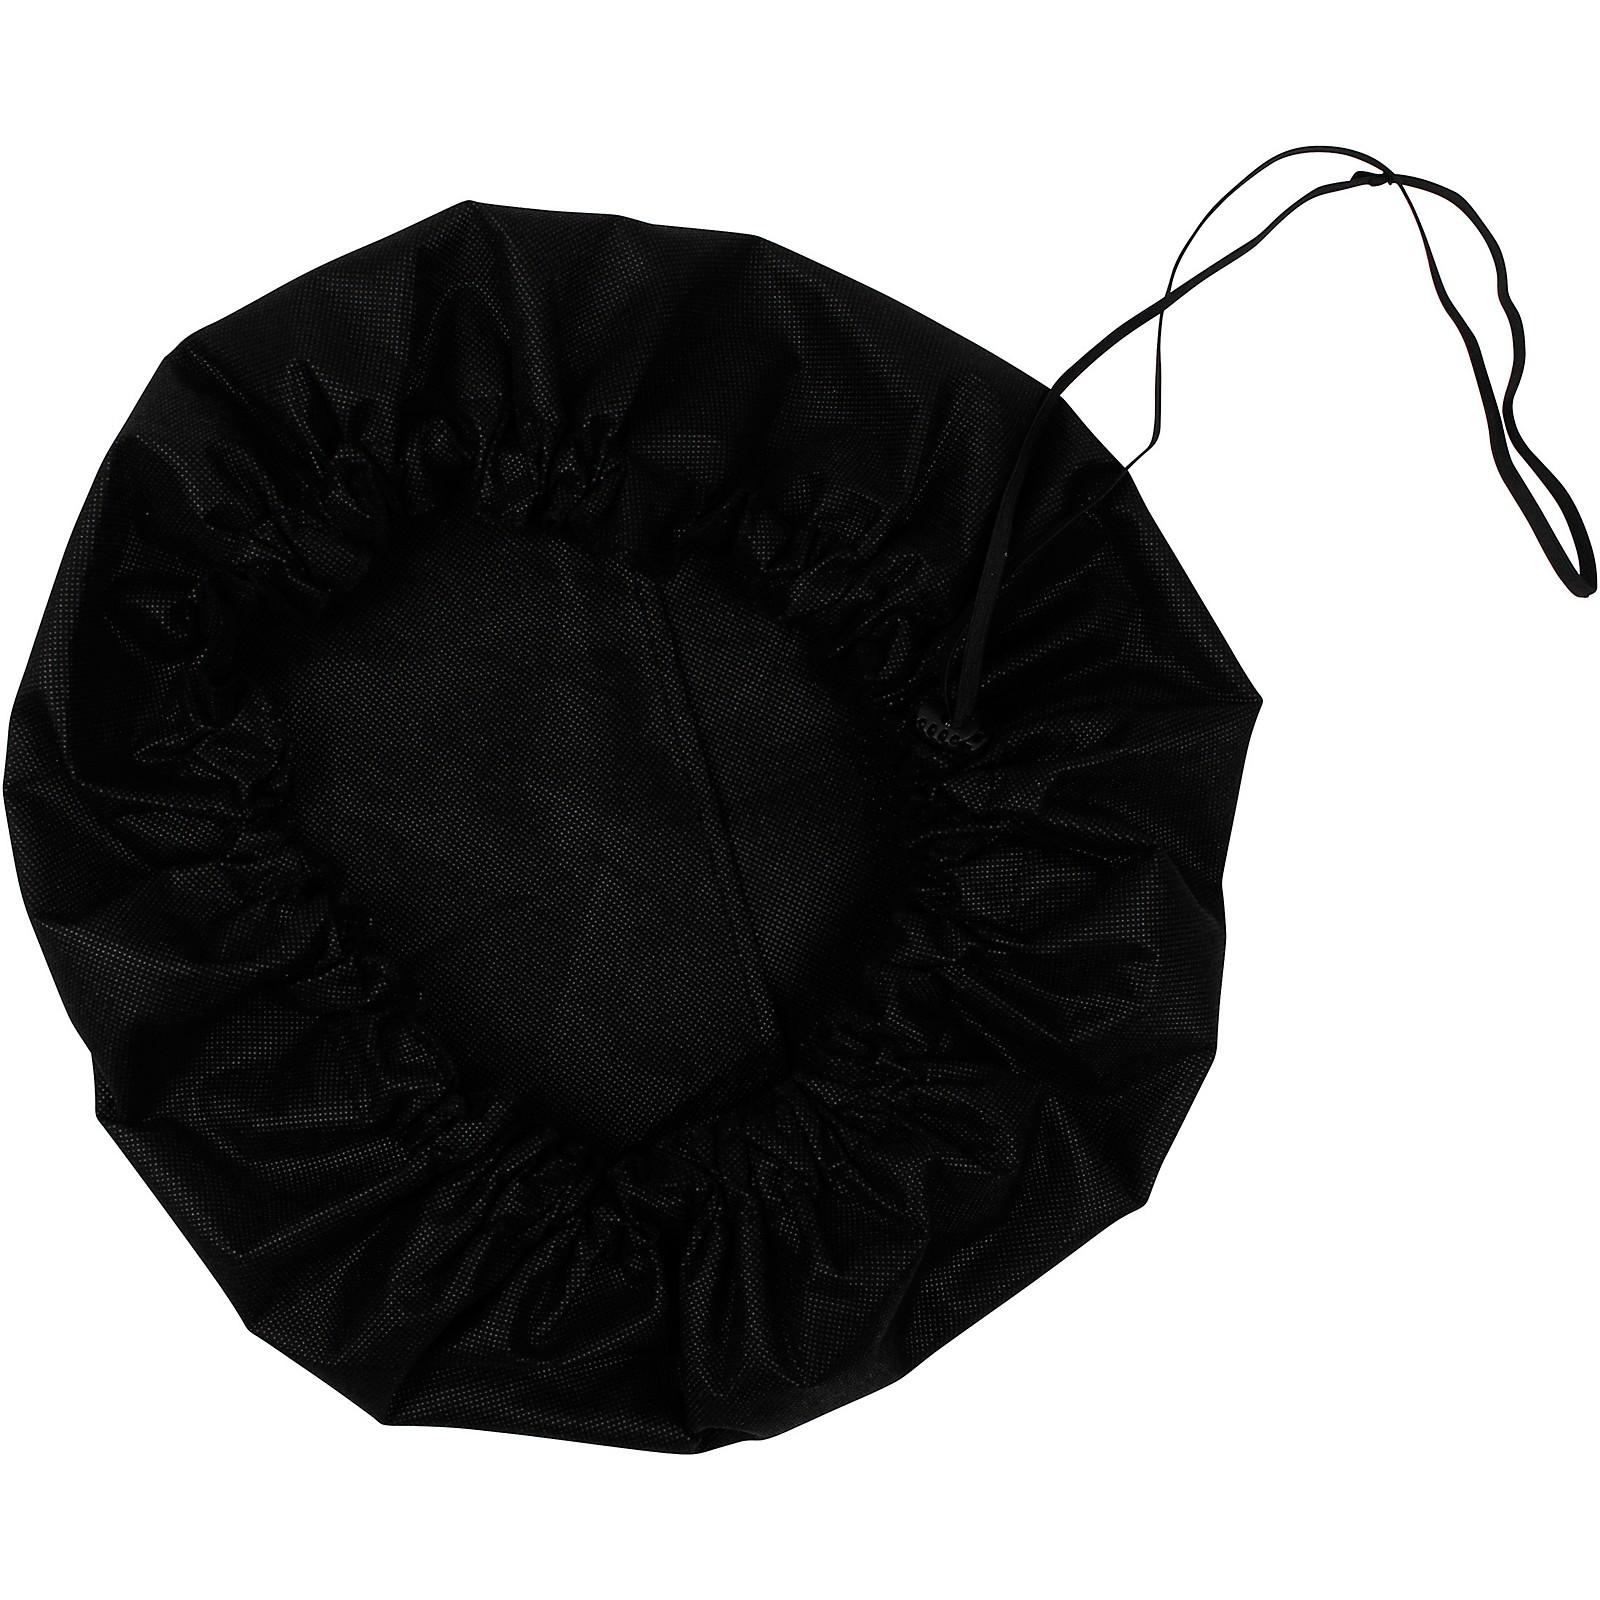 Gator Black Bell Mask With MERV-13 Filter, 24-26